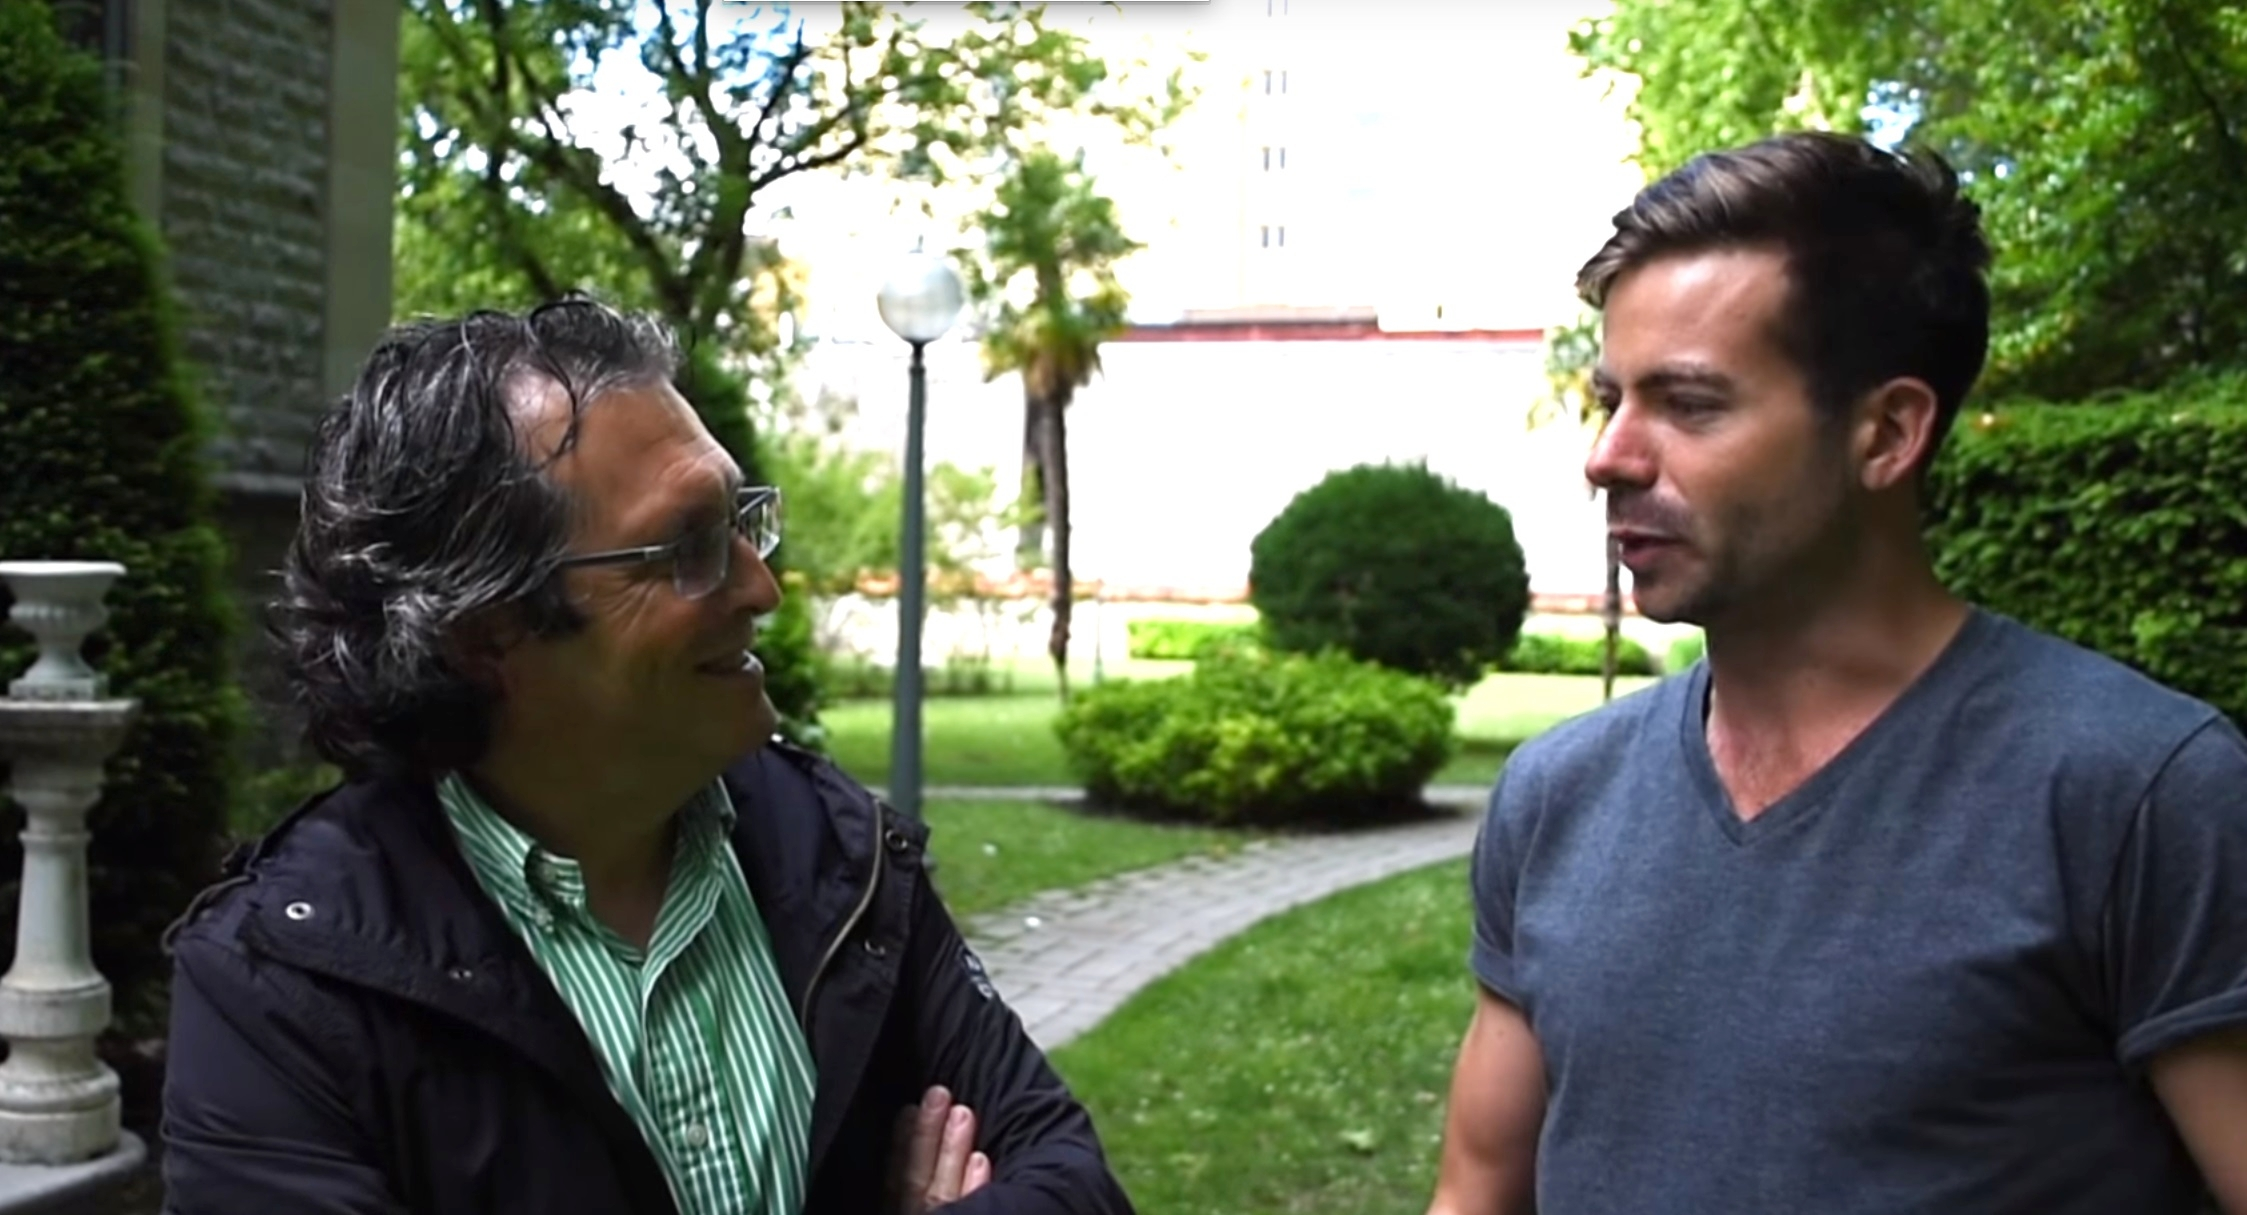 Interviewing Juan Carlos, Director of the Environmental Studies Centre